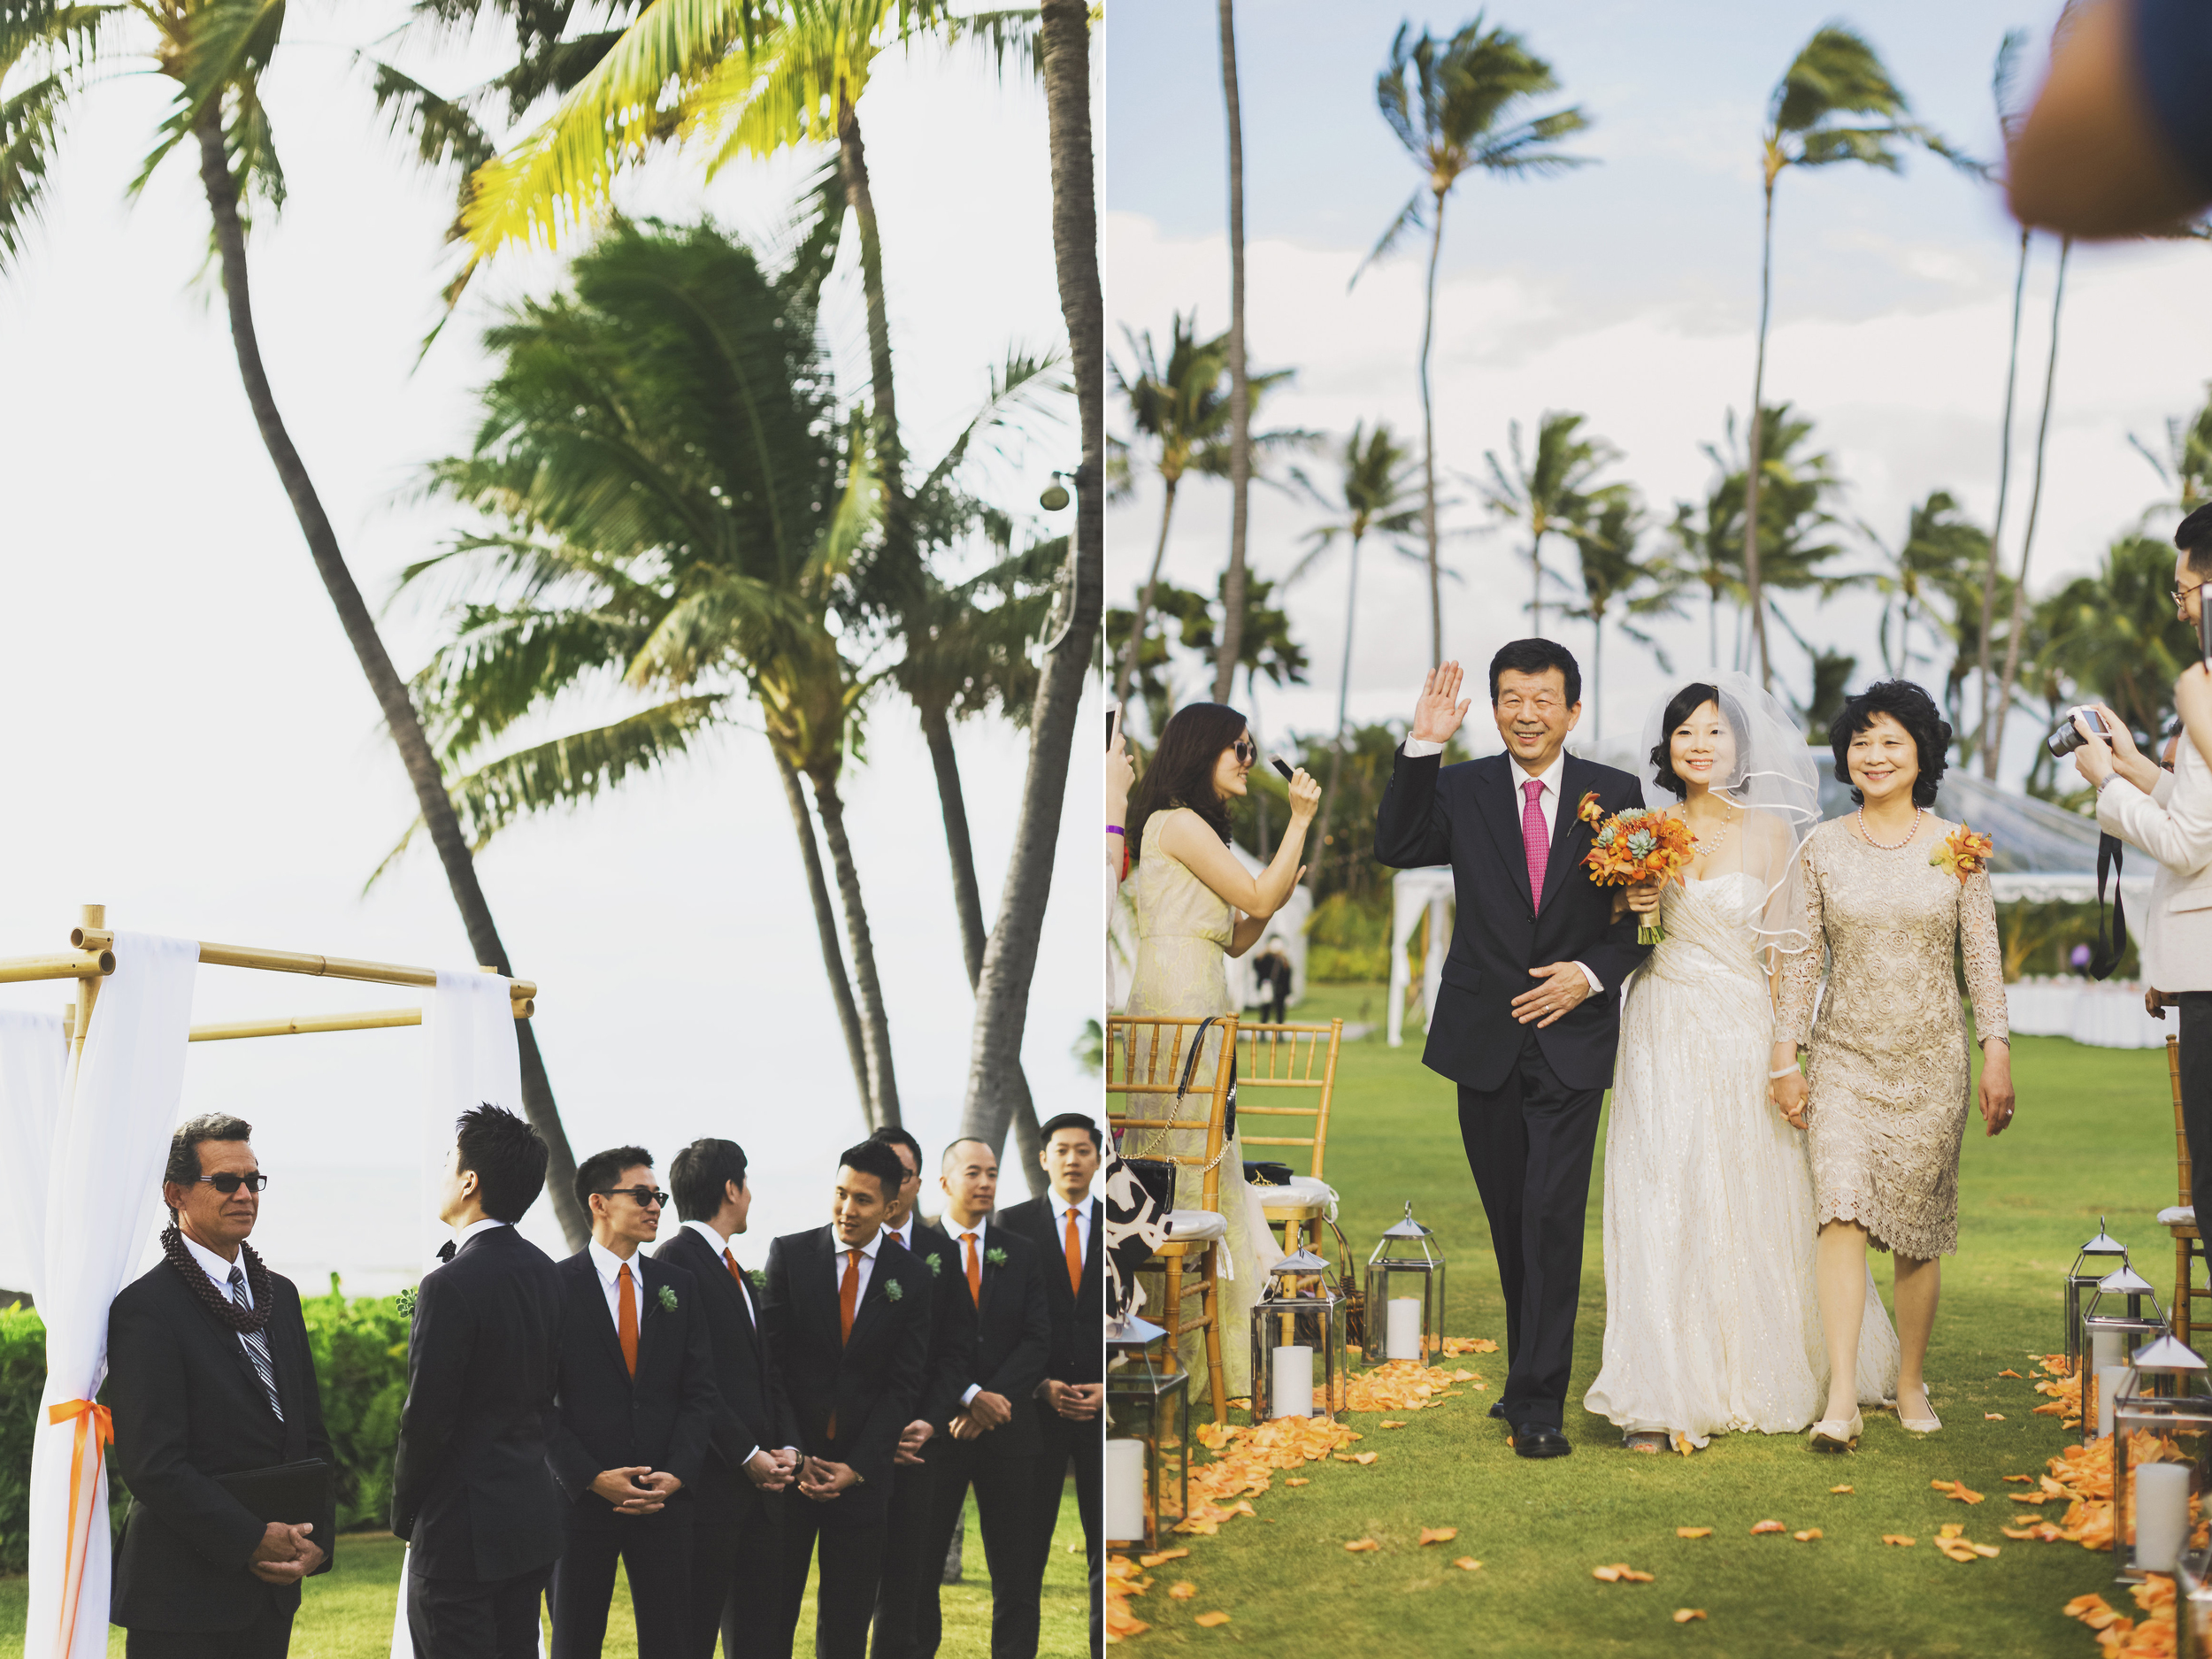 angie-diaz-photography-oahu-wedding-lanikuhonoa-shenshen-marshall-26.jpg